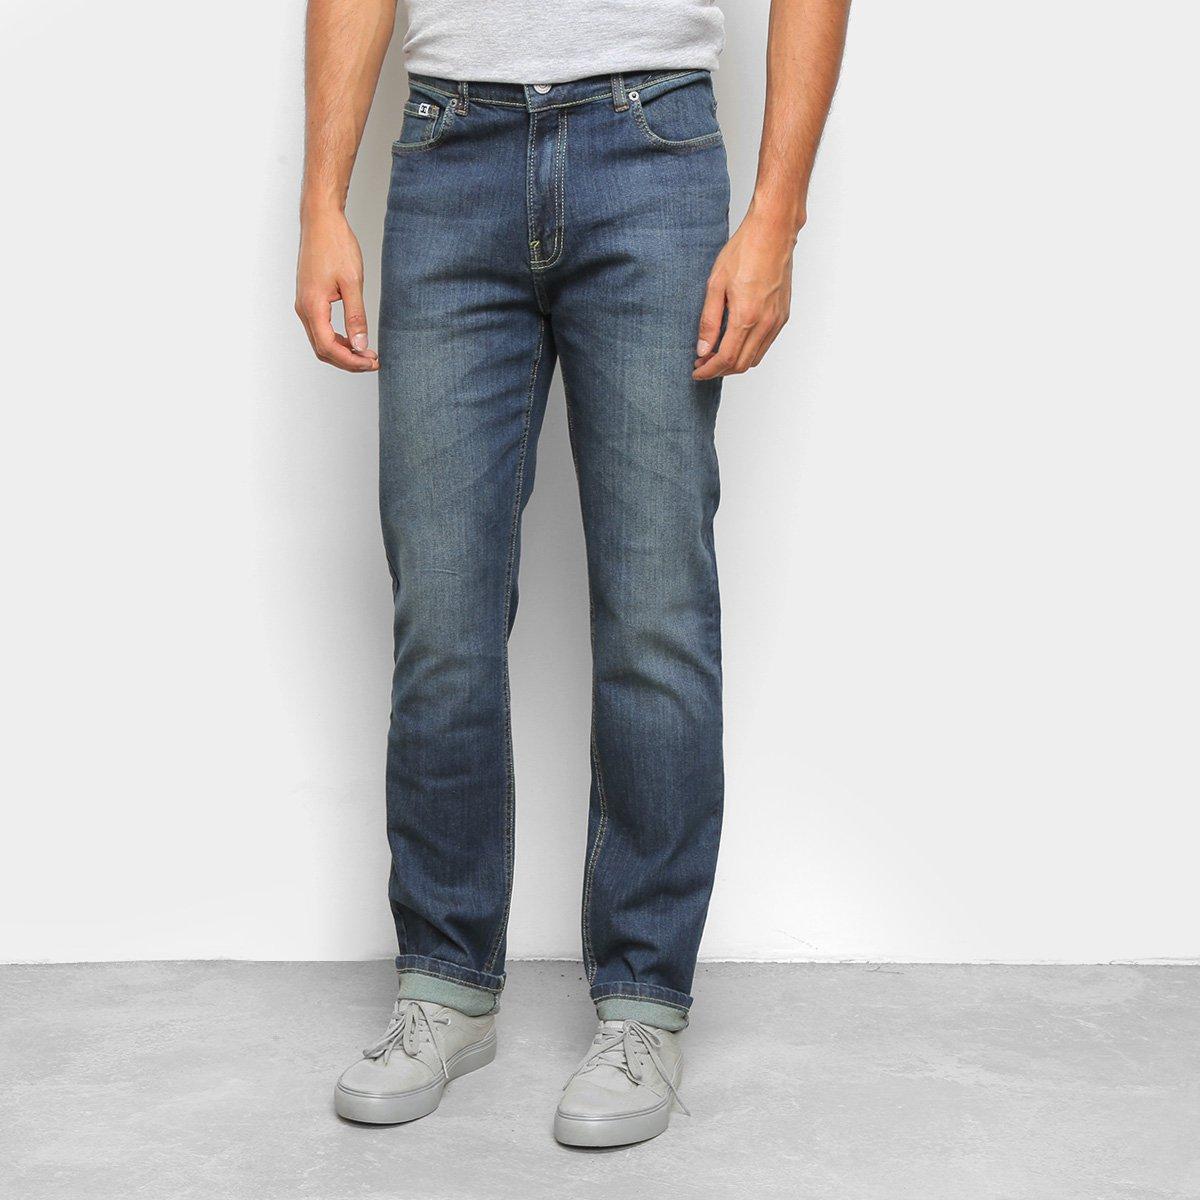 Calça Jeans DC Shoes Worker Masculina